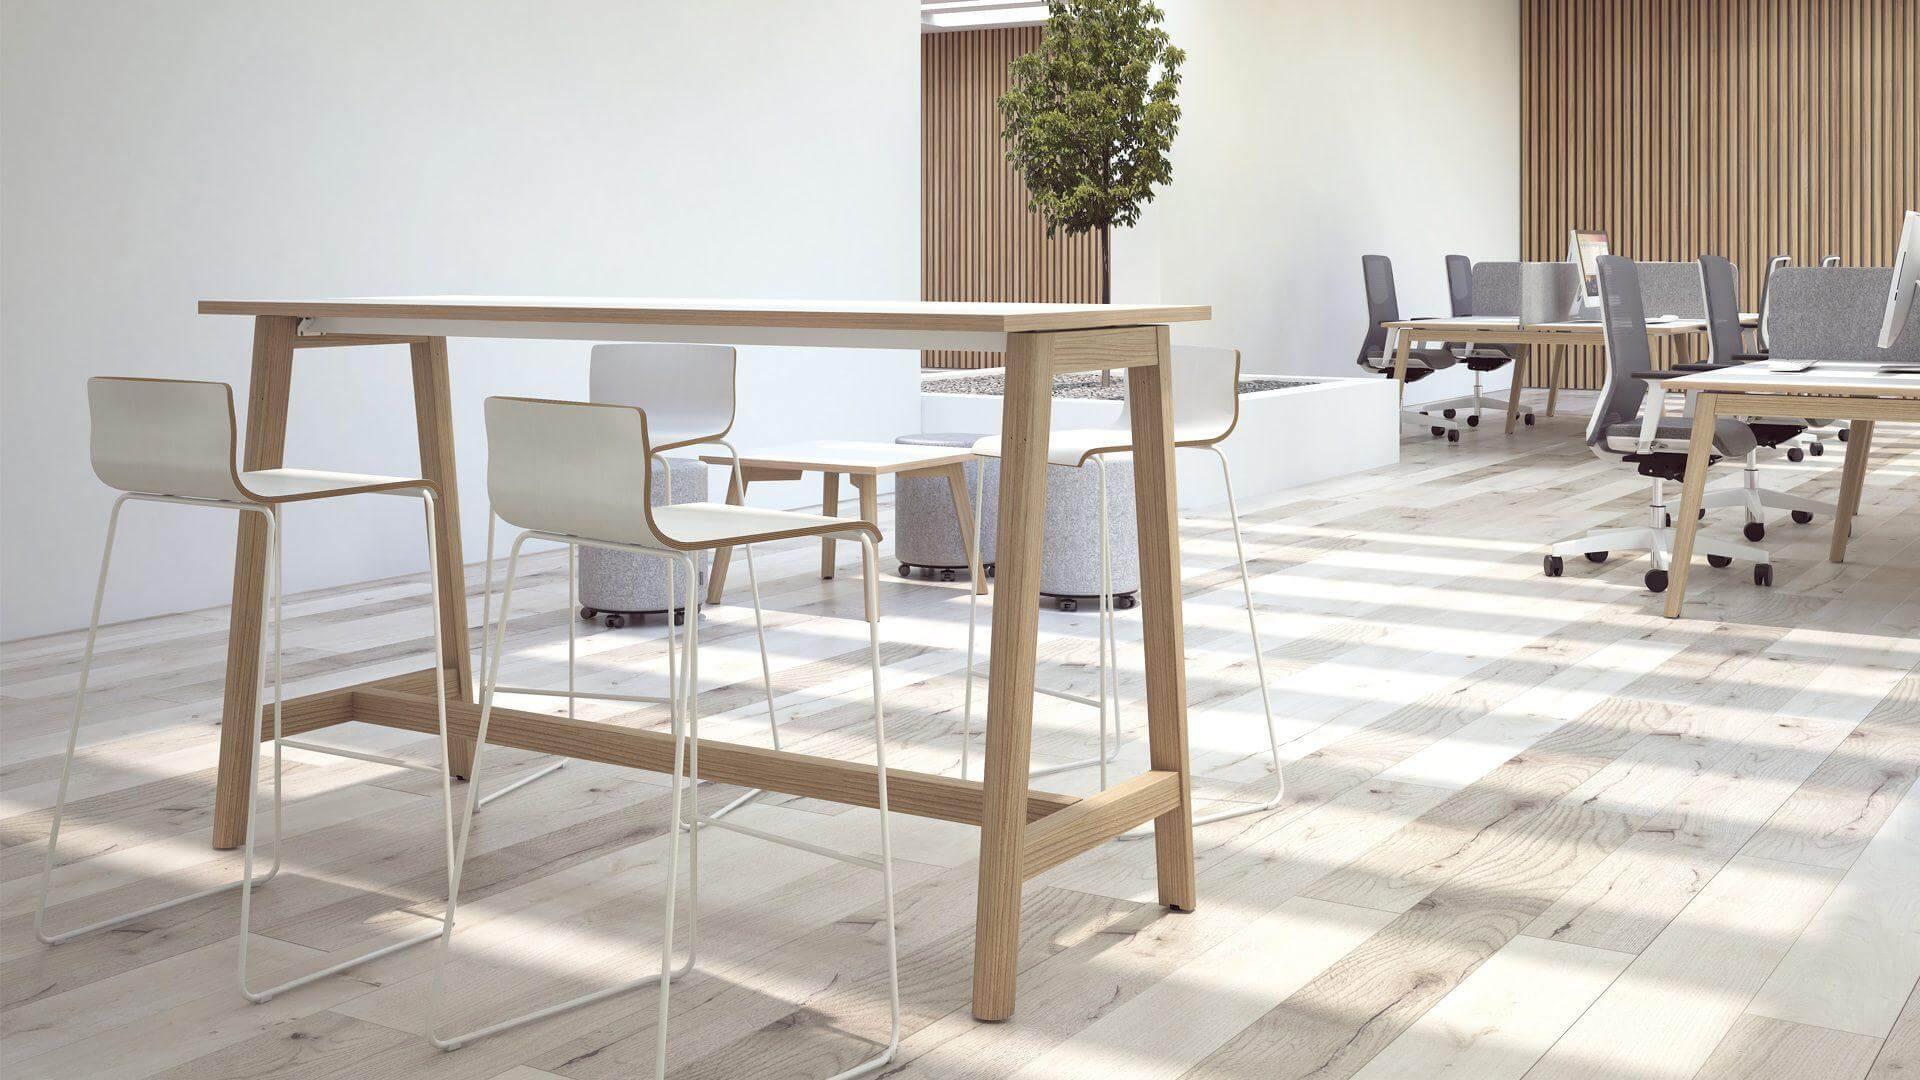 stół do krótkich spotkań na stojąco